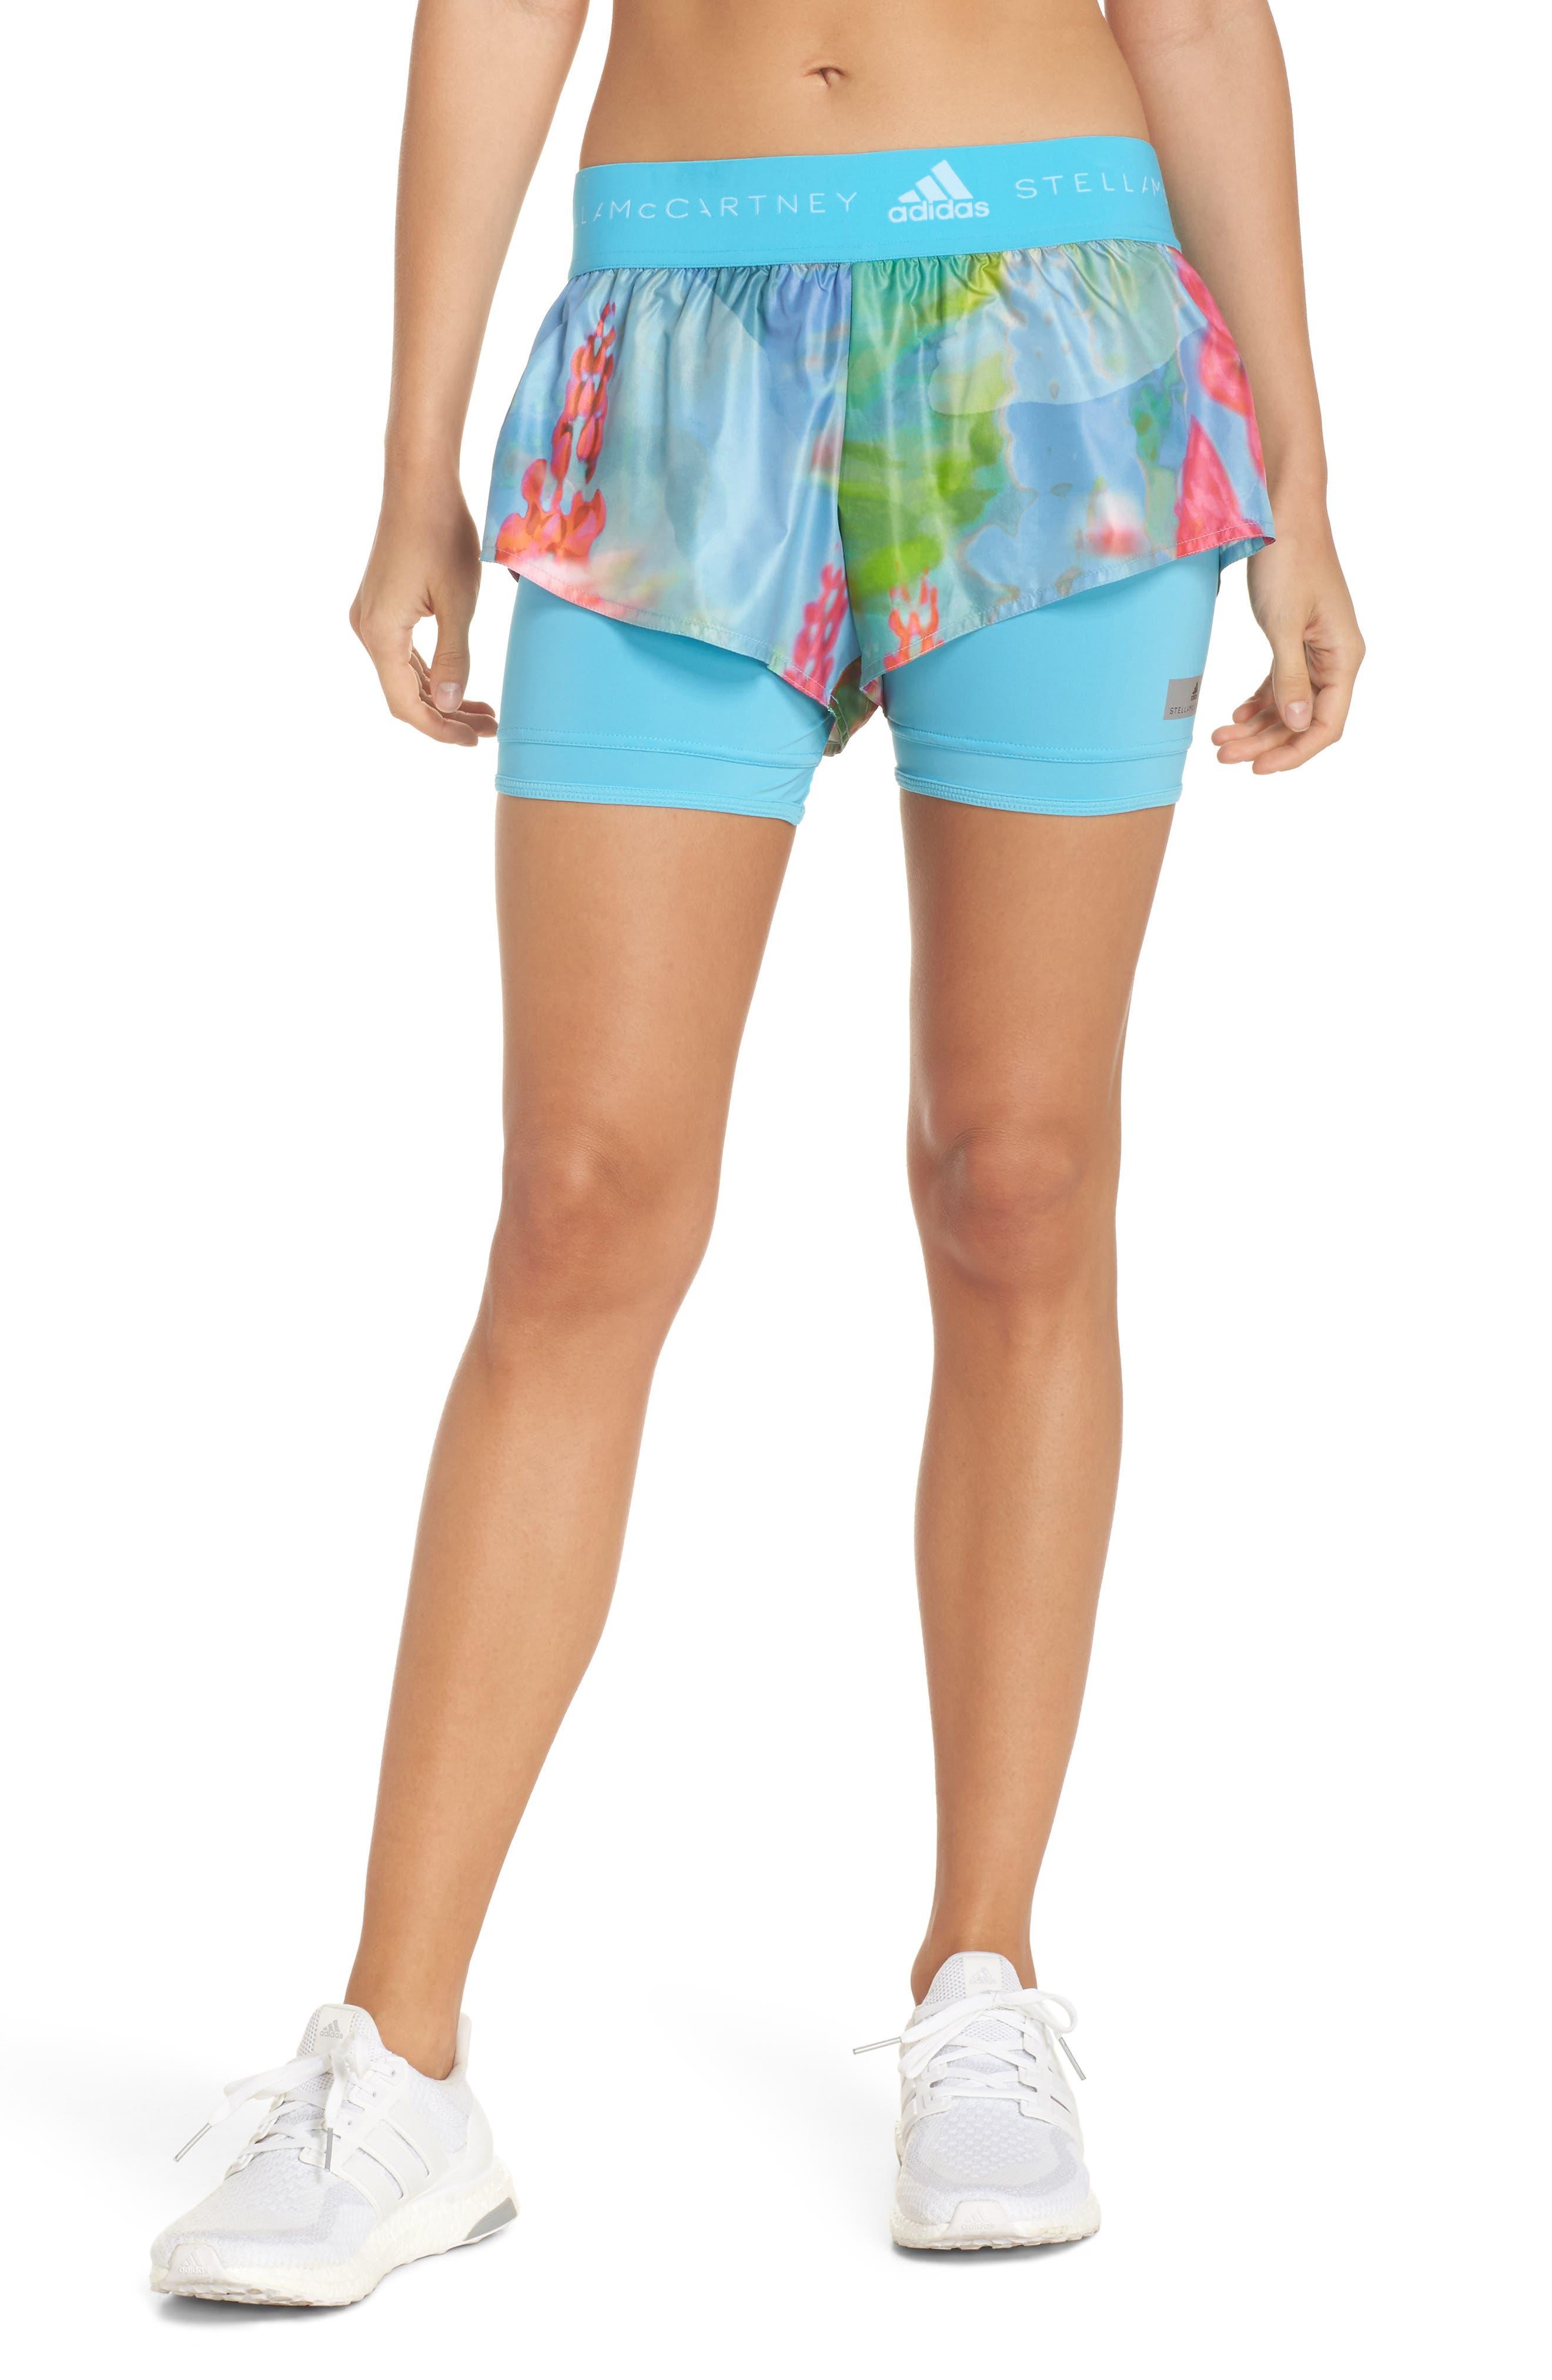 2-in-1 Run Shorts,                         Main,                         color, Mirror Blue-Smc/ Multicolor